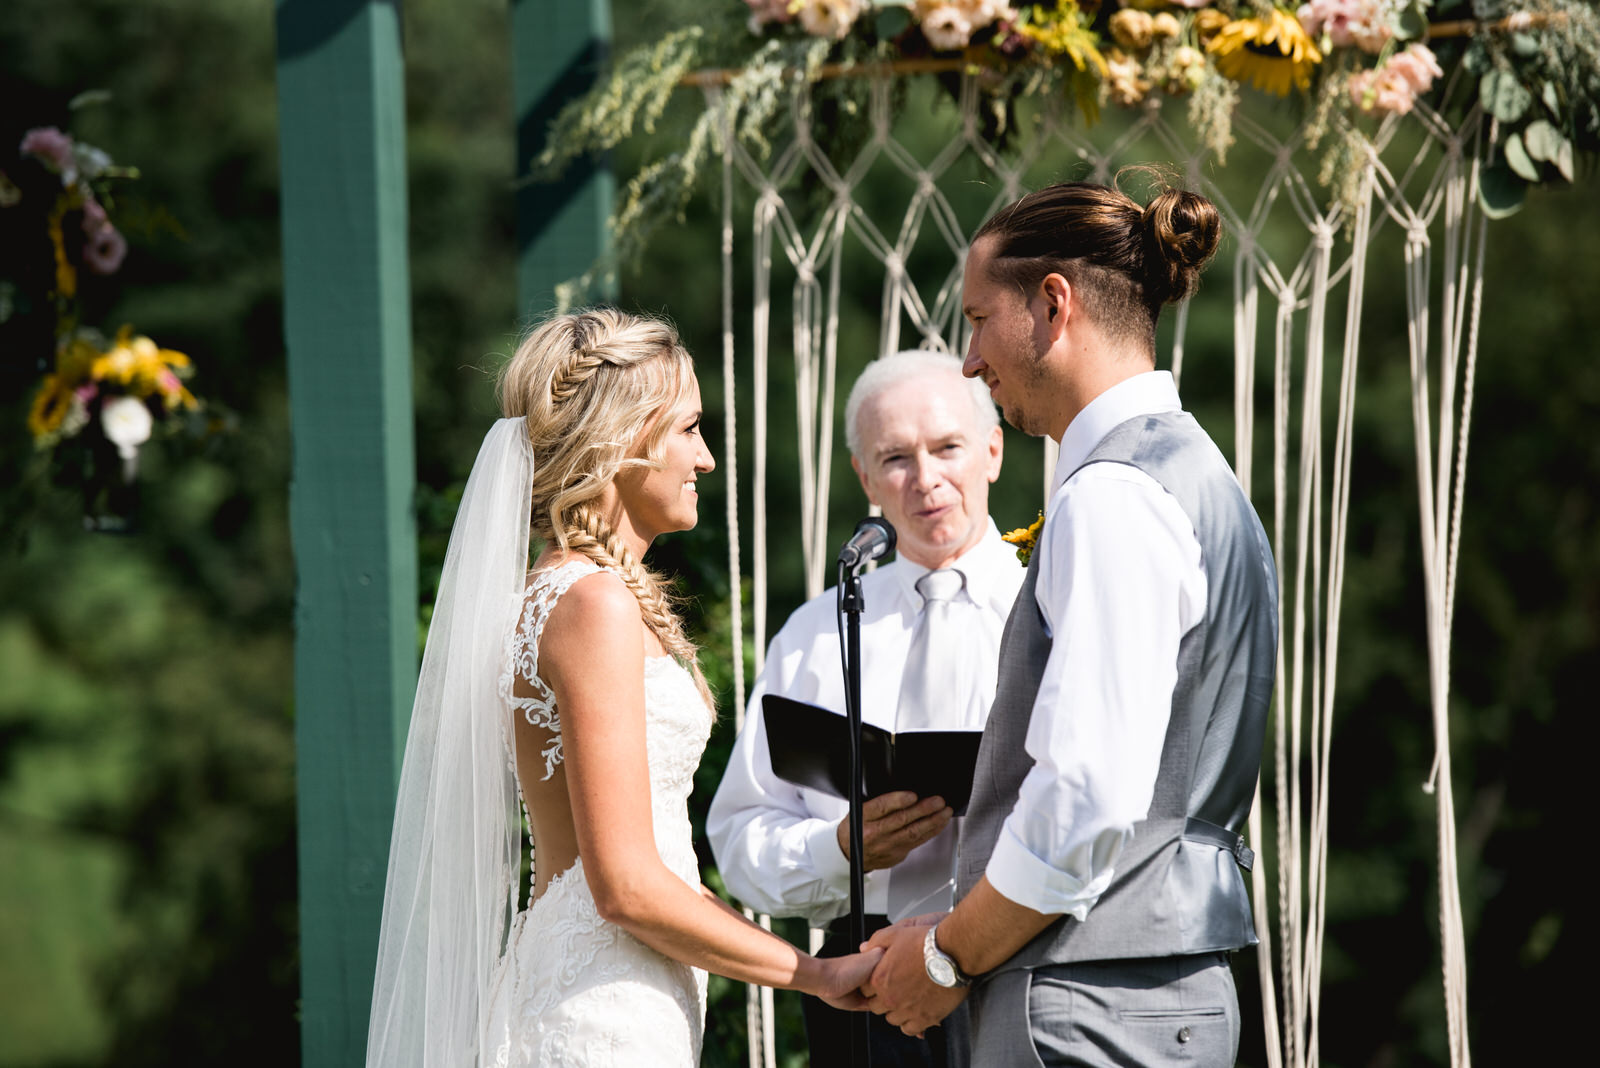 destiny-hill-farm-wedding-photos-pittsburgh-wedding-photographers-49.jpg